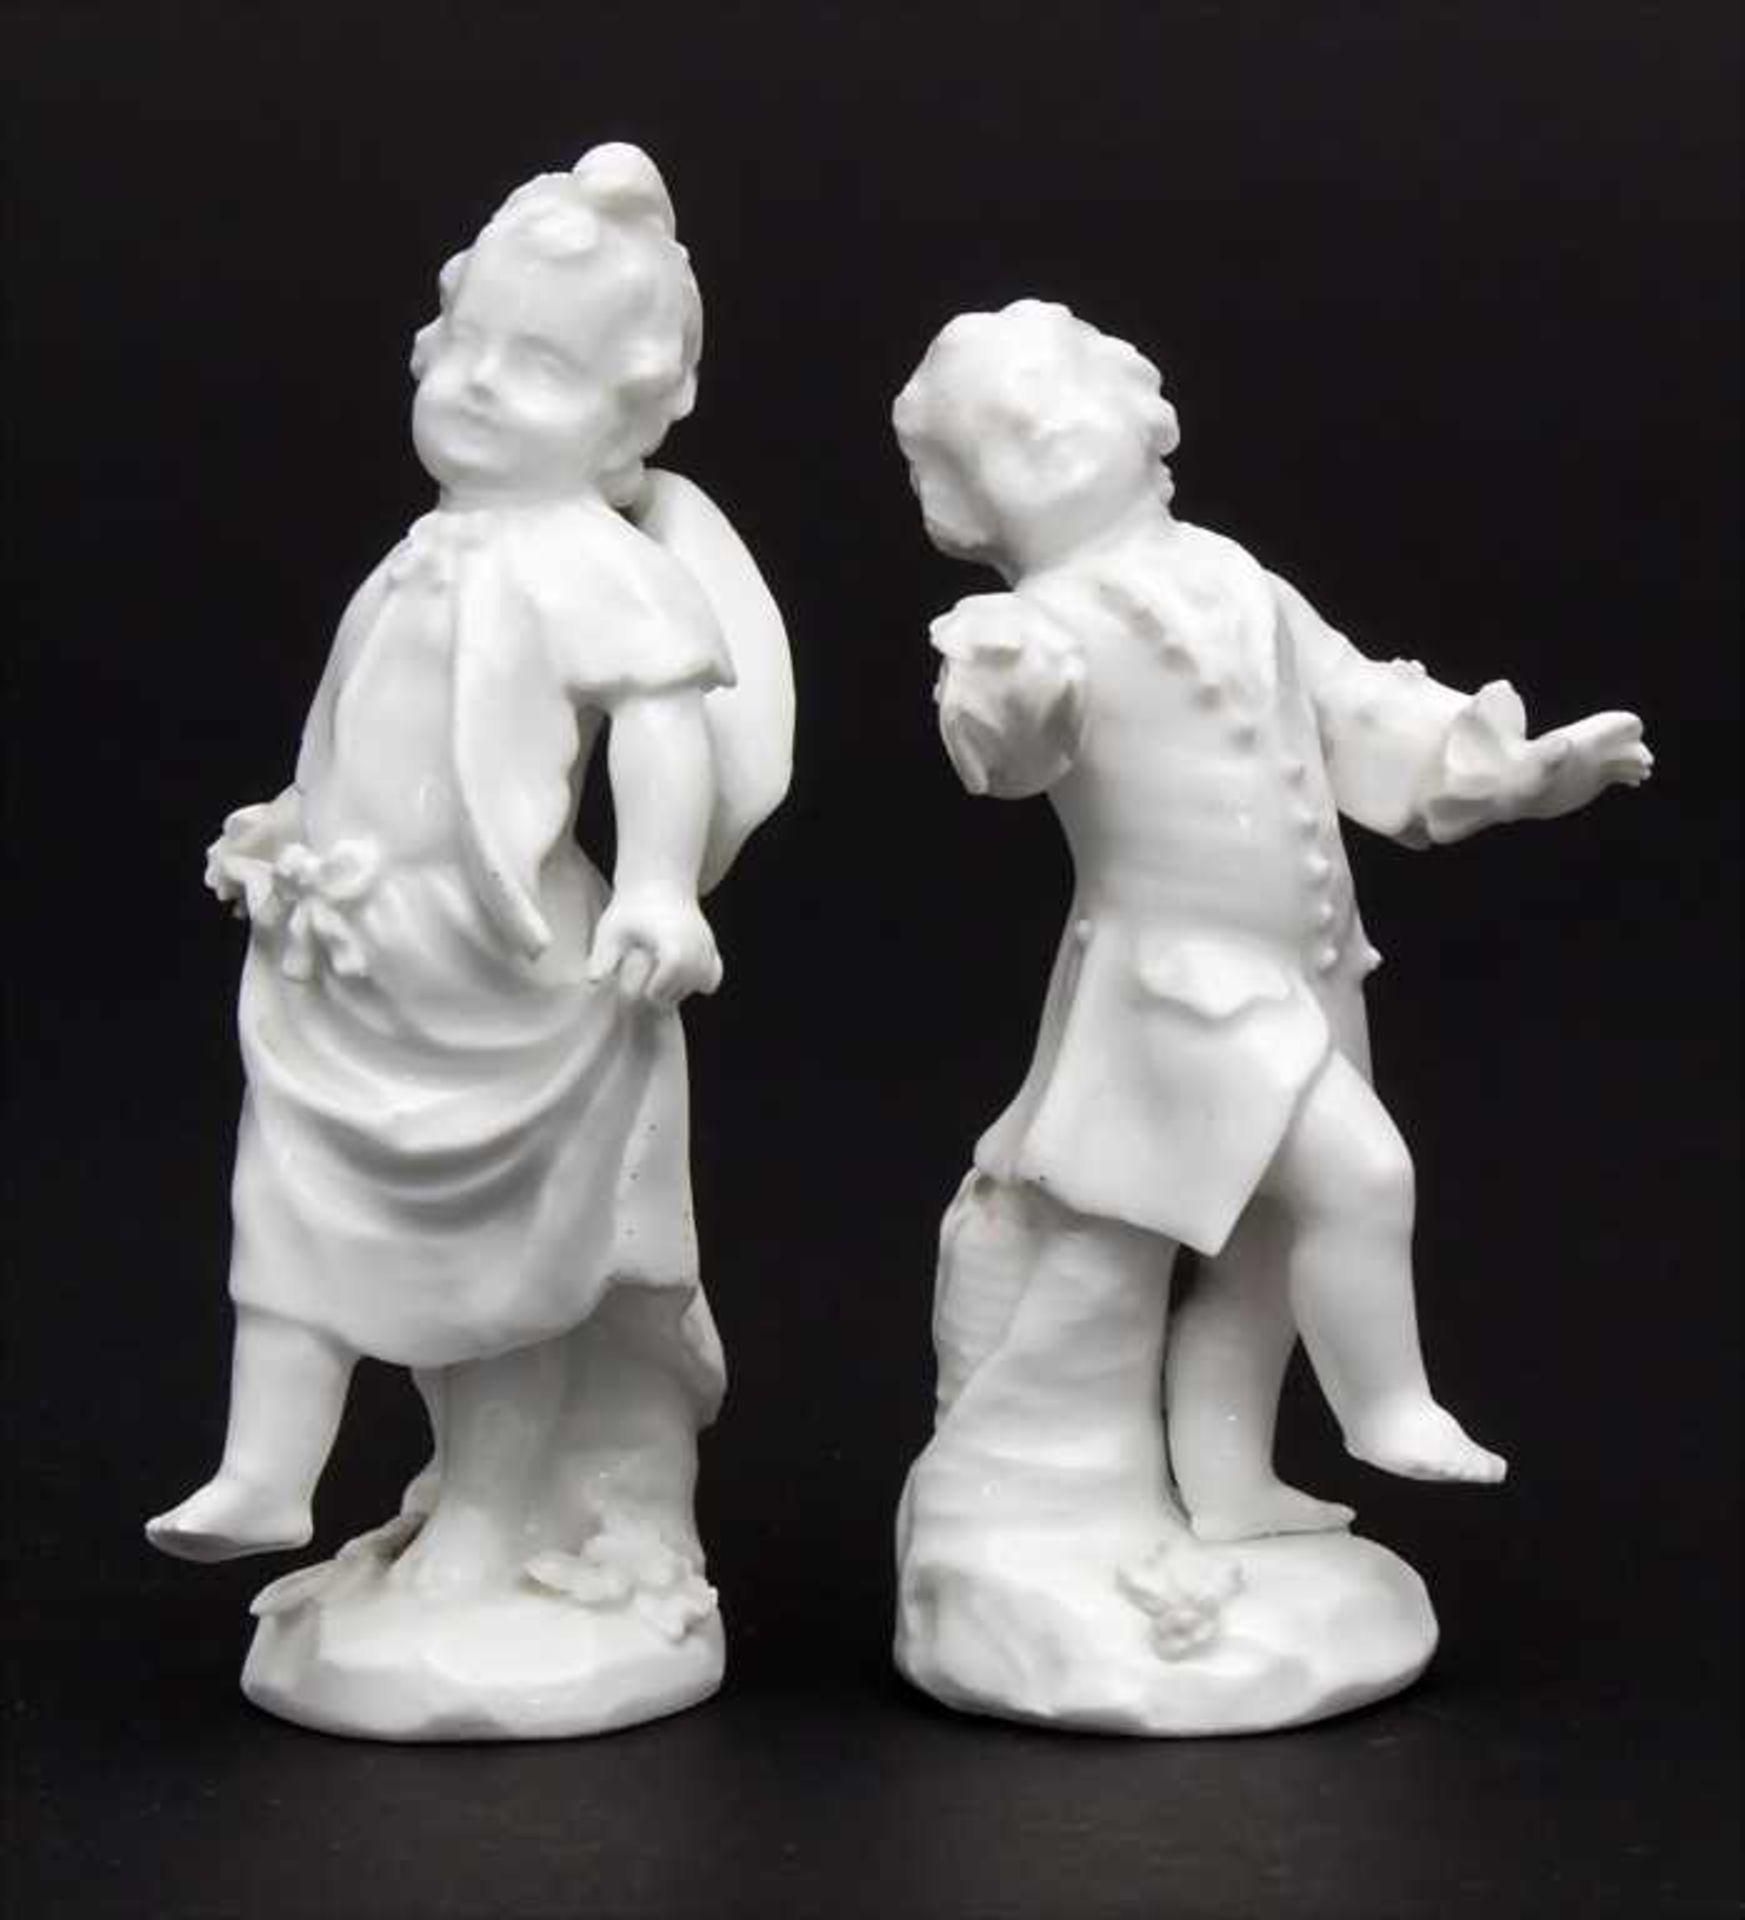 2 tanzende Kinder / A dancing boy and girl, wohl Michel Victor Acier, Meissen, um 1760